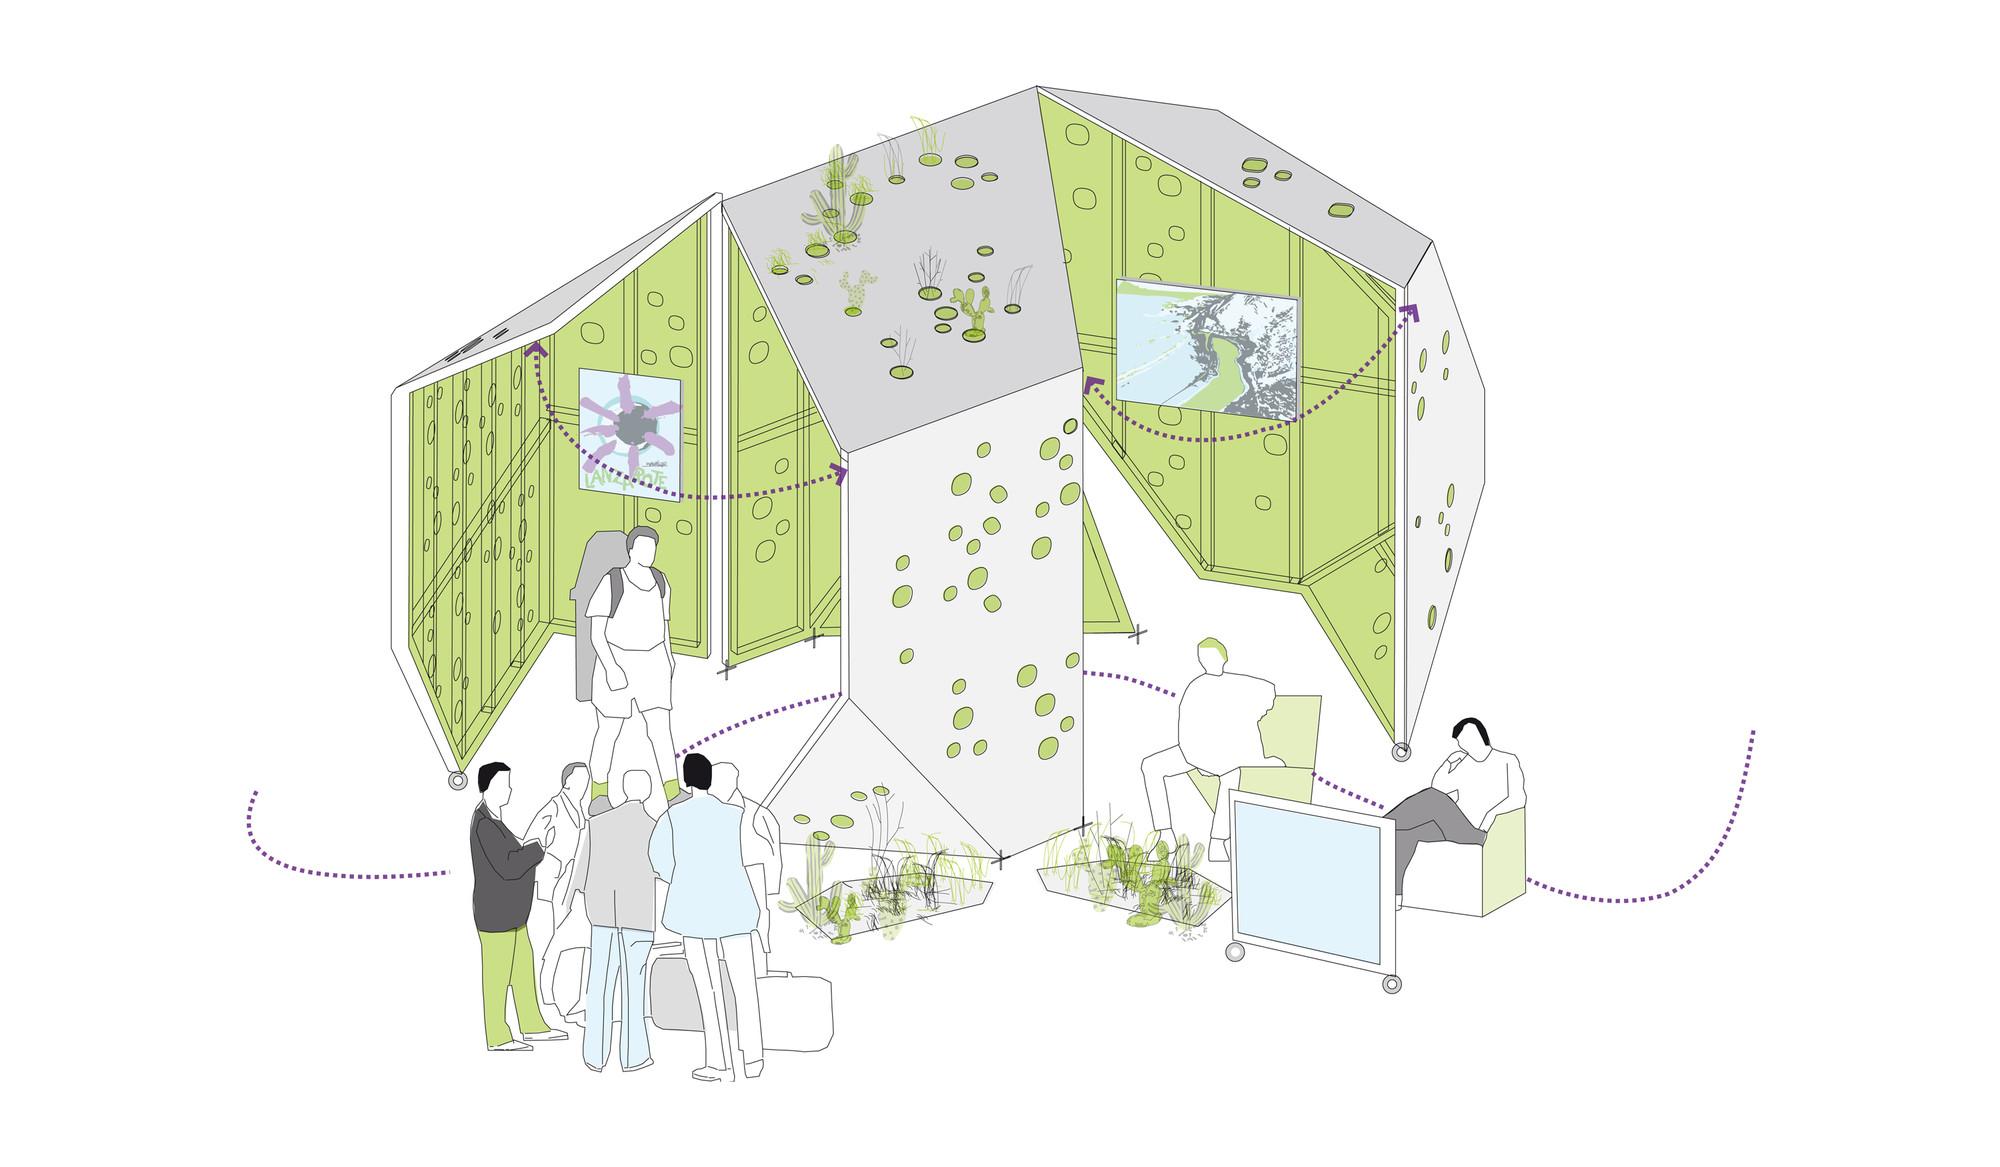 Courtesy of OOIIO Arquitectura